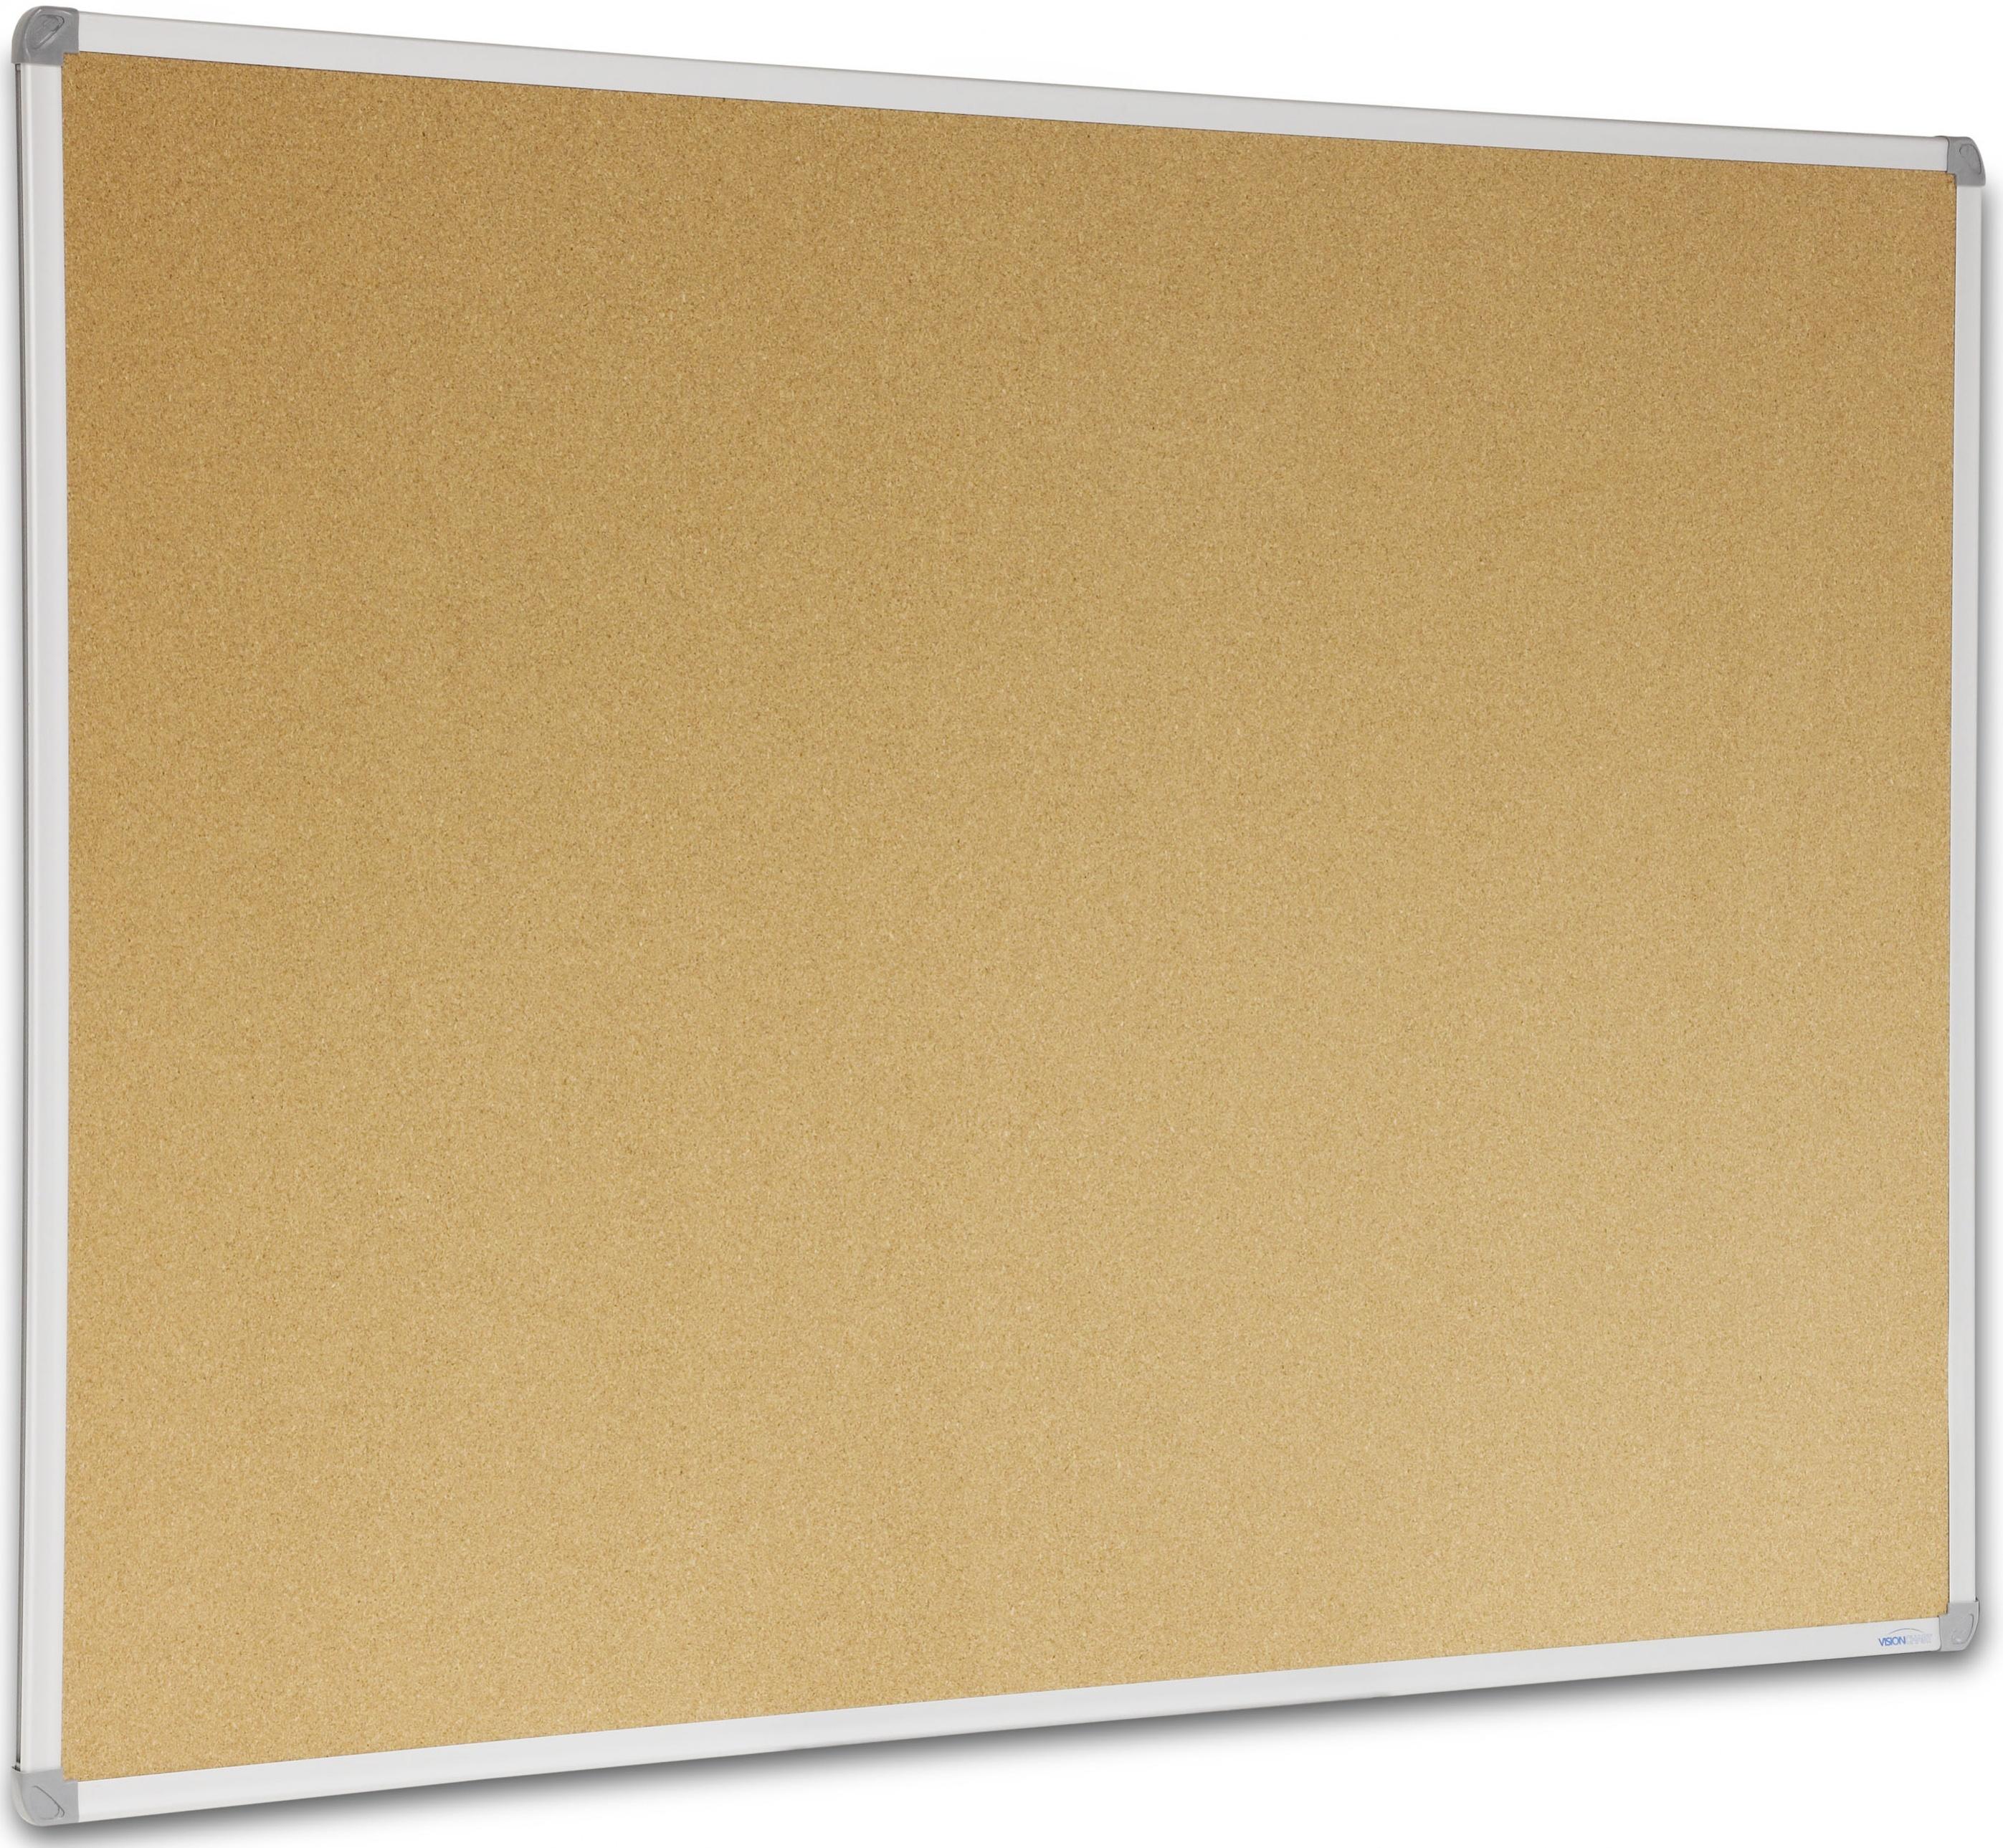 Cork or Felt Pinboards Noosa